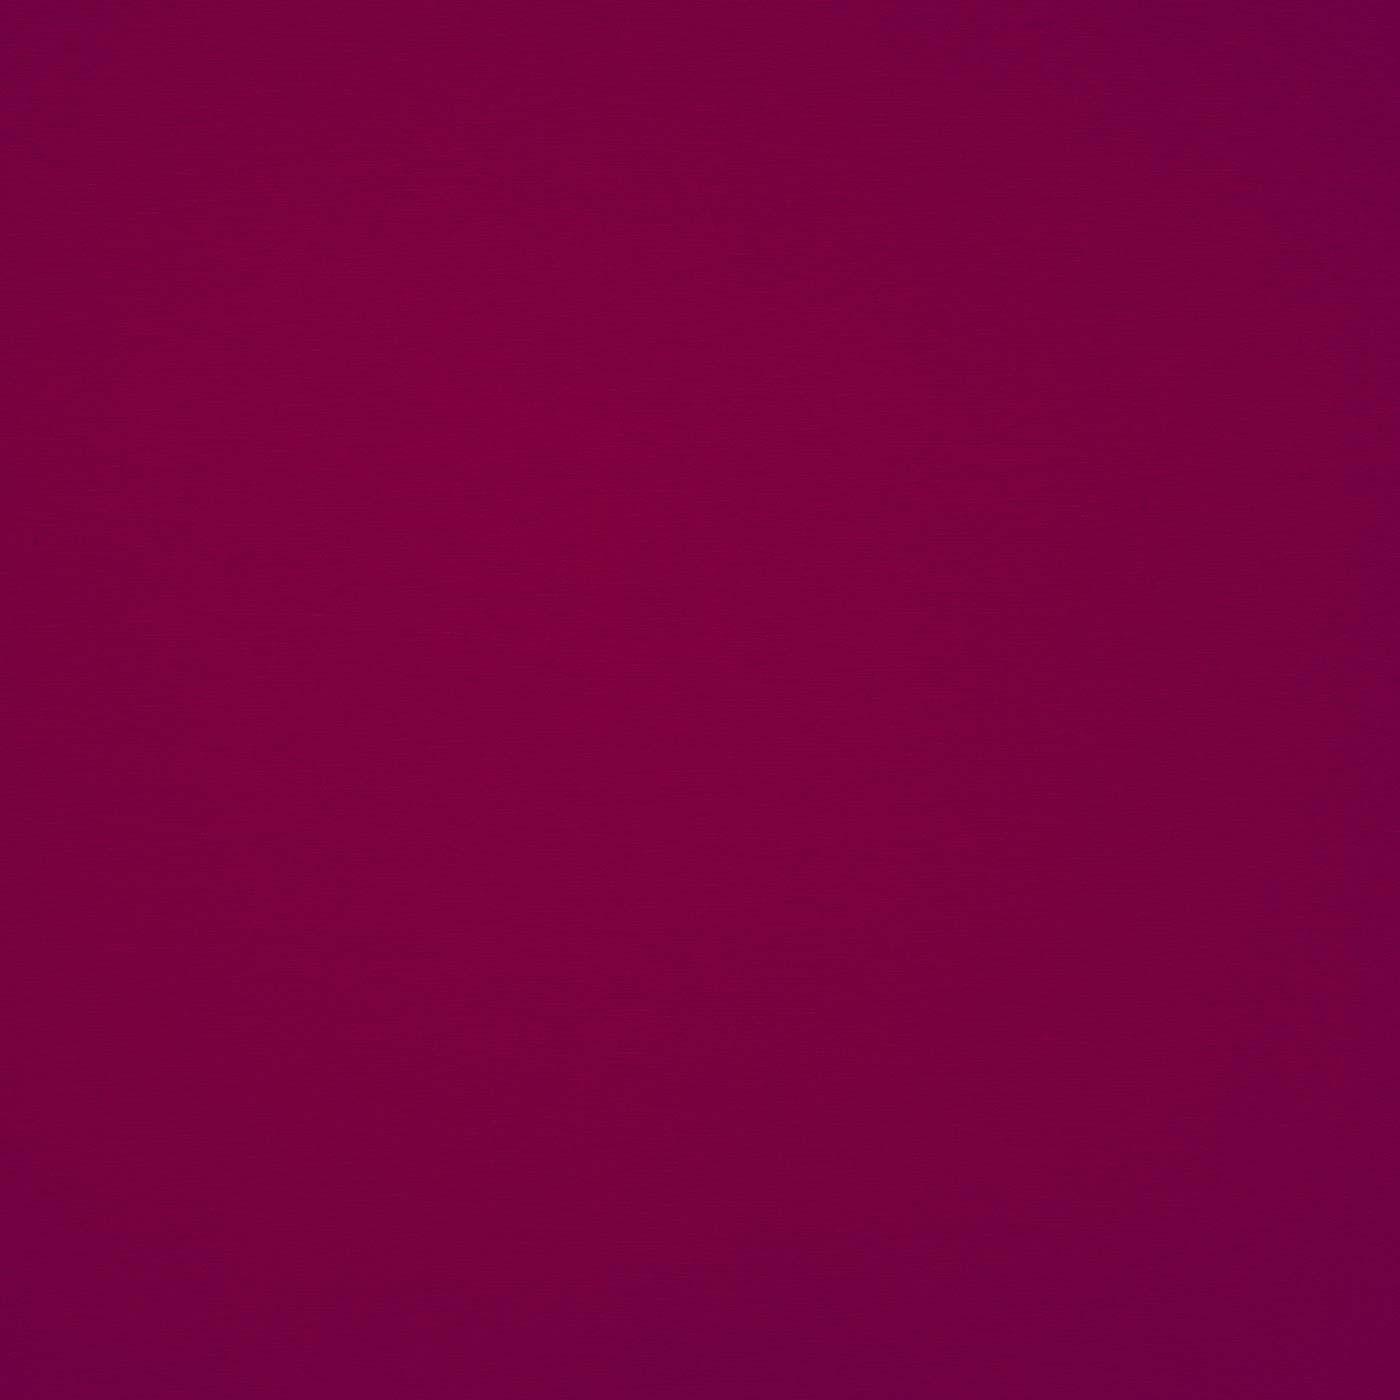 Union Burgundy